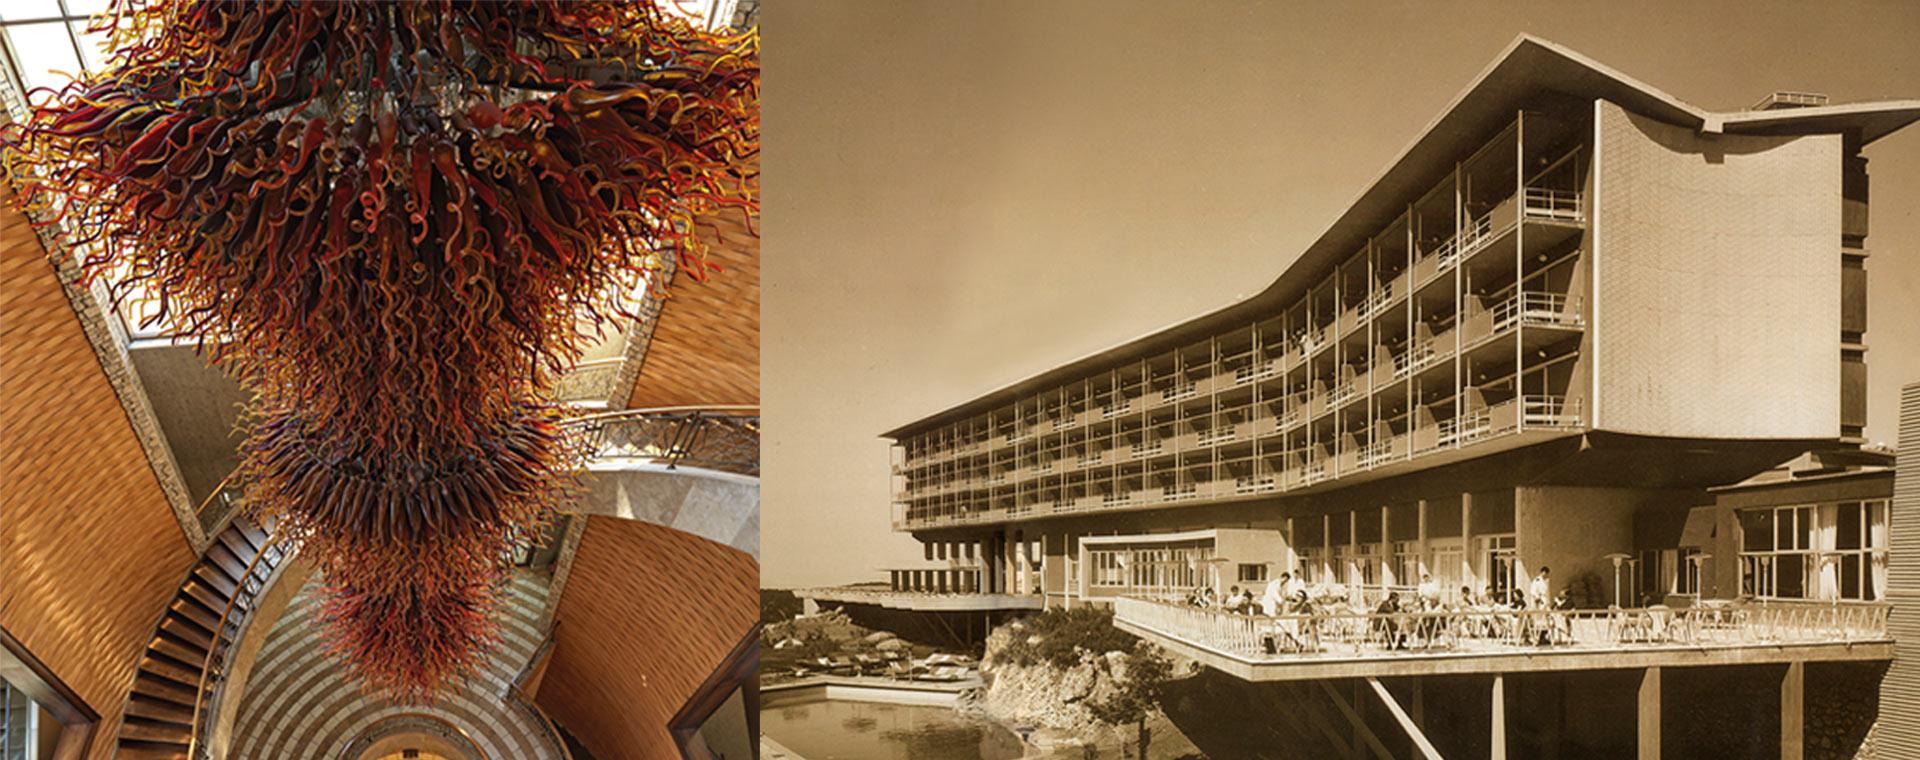 Regency Casino Mont Parnes: Η αίγλη του παρελθόντος στο παρόν - Φωτογραφία 1